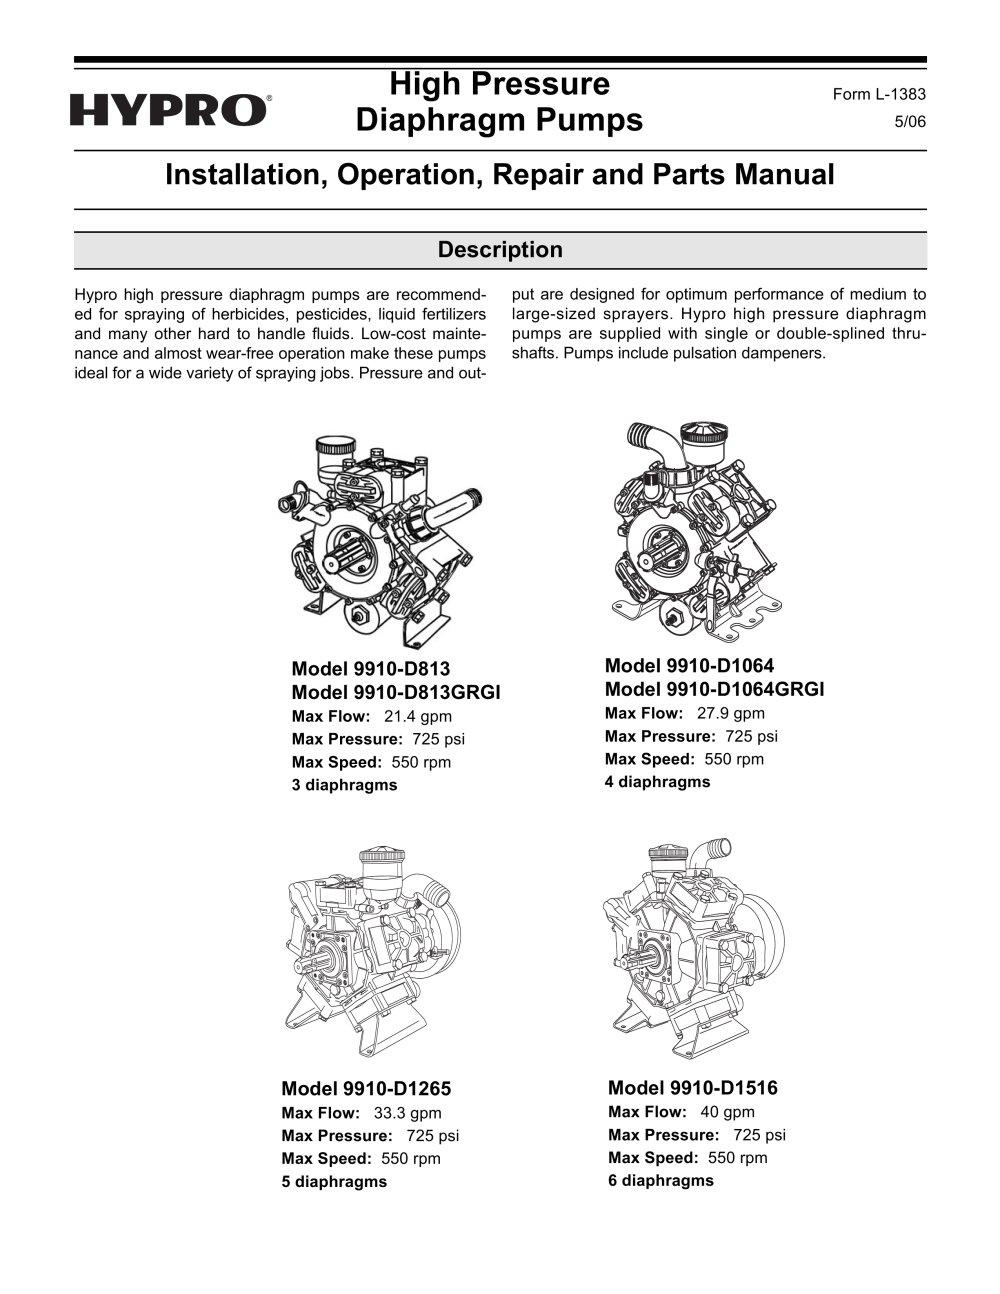 High pressure diaphragm pump oipm hypro pressure cleaning pdf high pressure diaphragm pump oipm 1 24 pages ccuart Choice Image